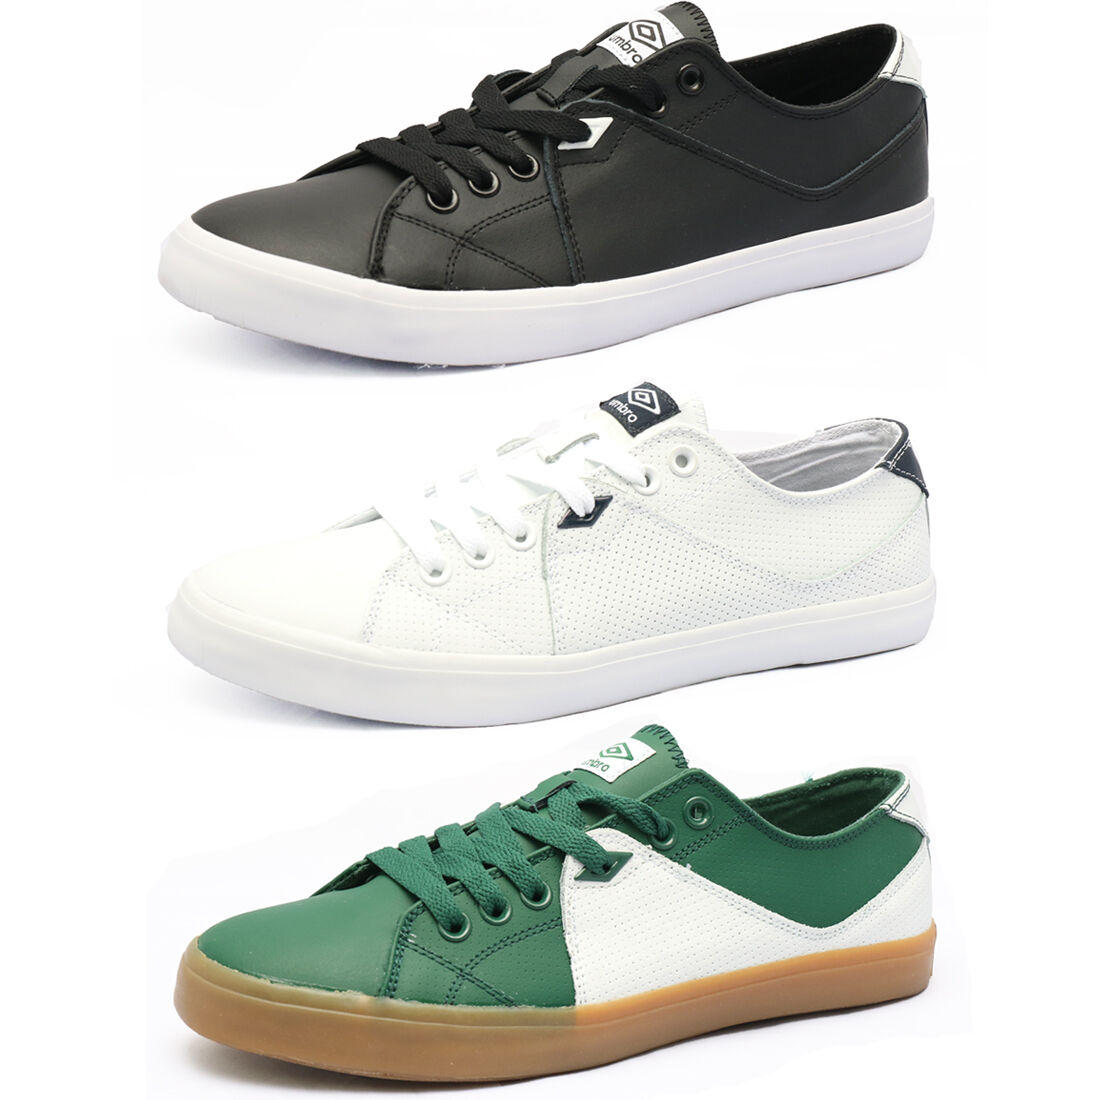 new umbro casual shoes uml1000ls milton x seattle 3 colors